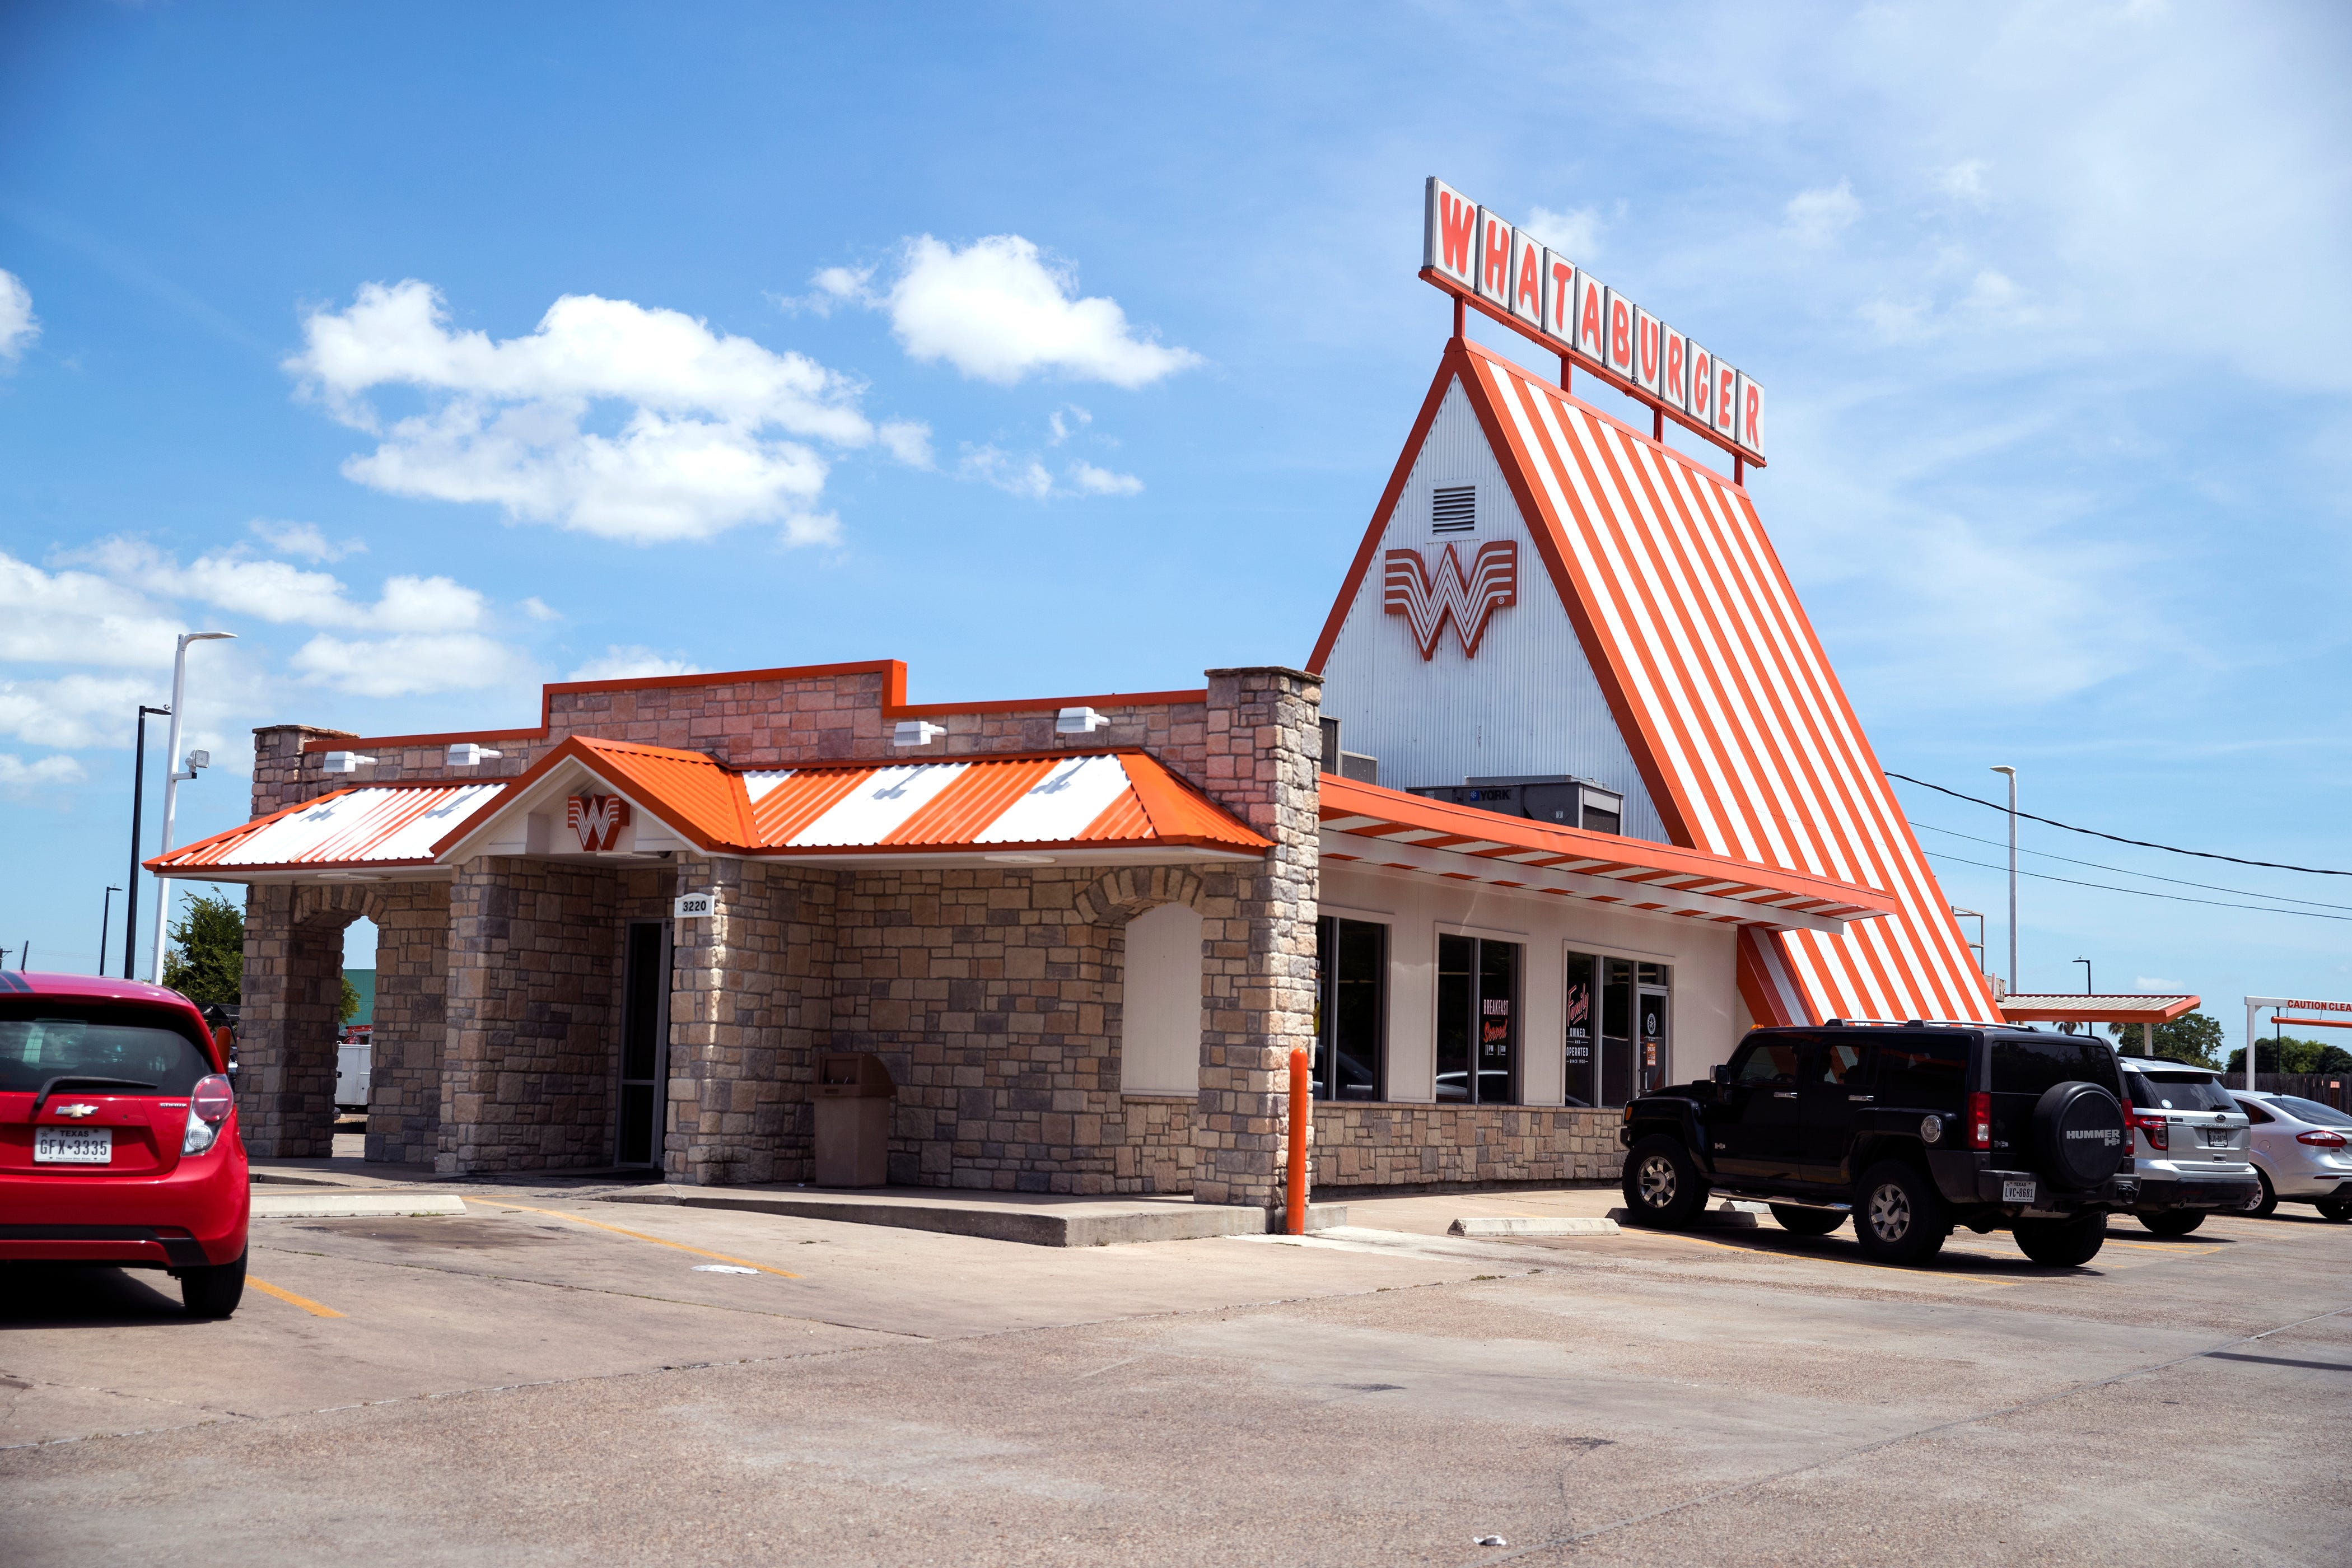 Whataburger lawyer: Restaurant won't change